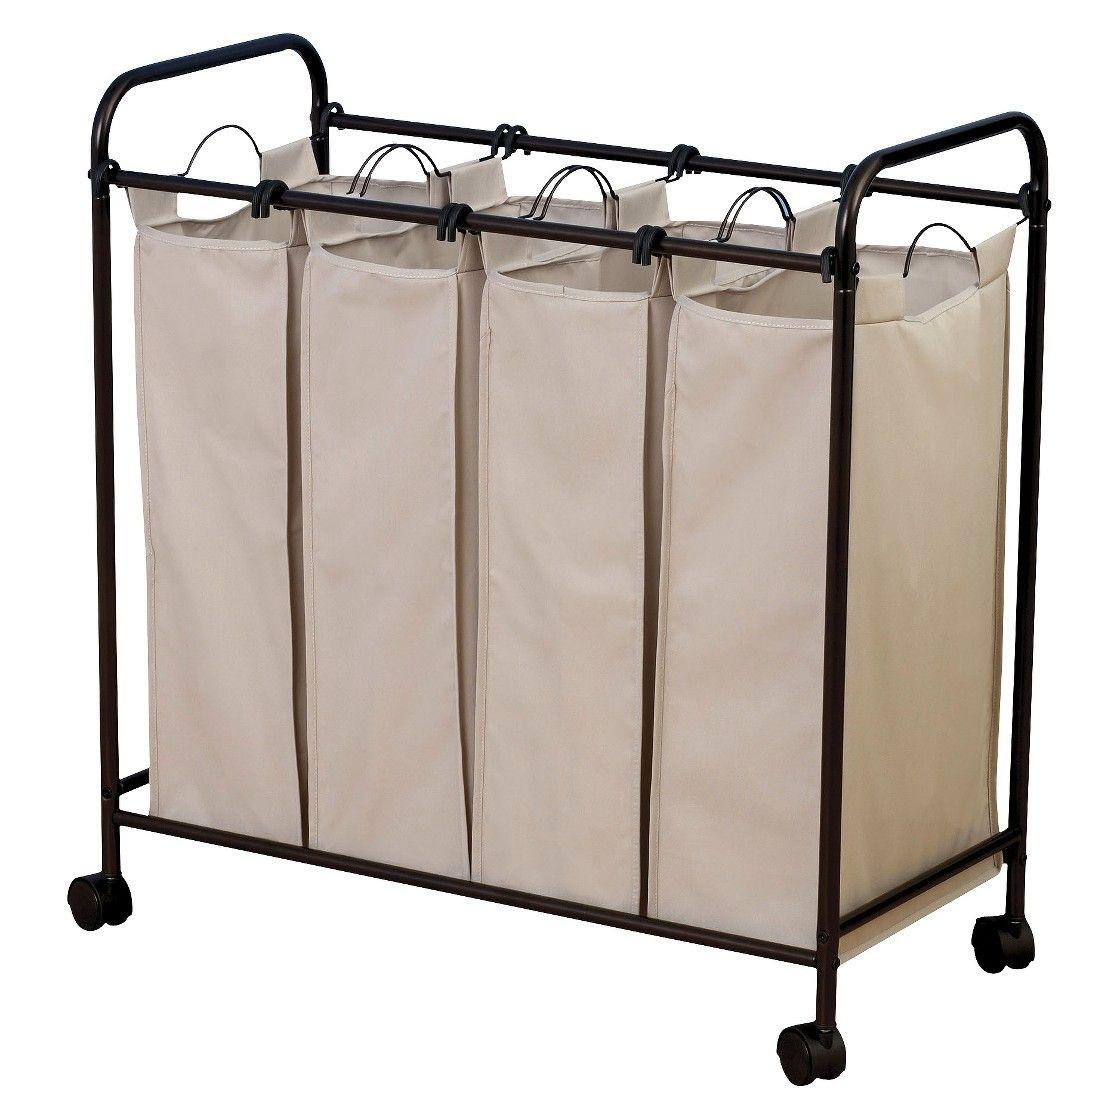 Household Essentials Quad Compartment Laundry Sorter Laundry